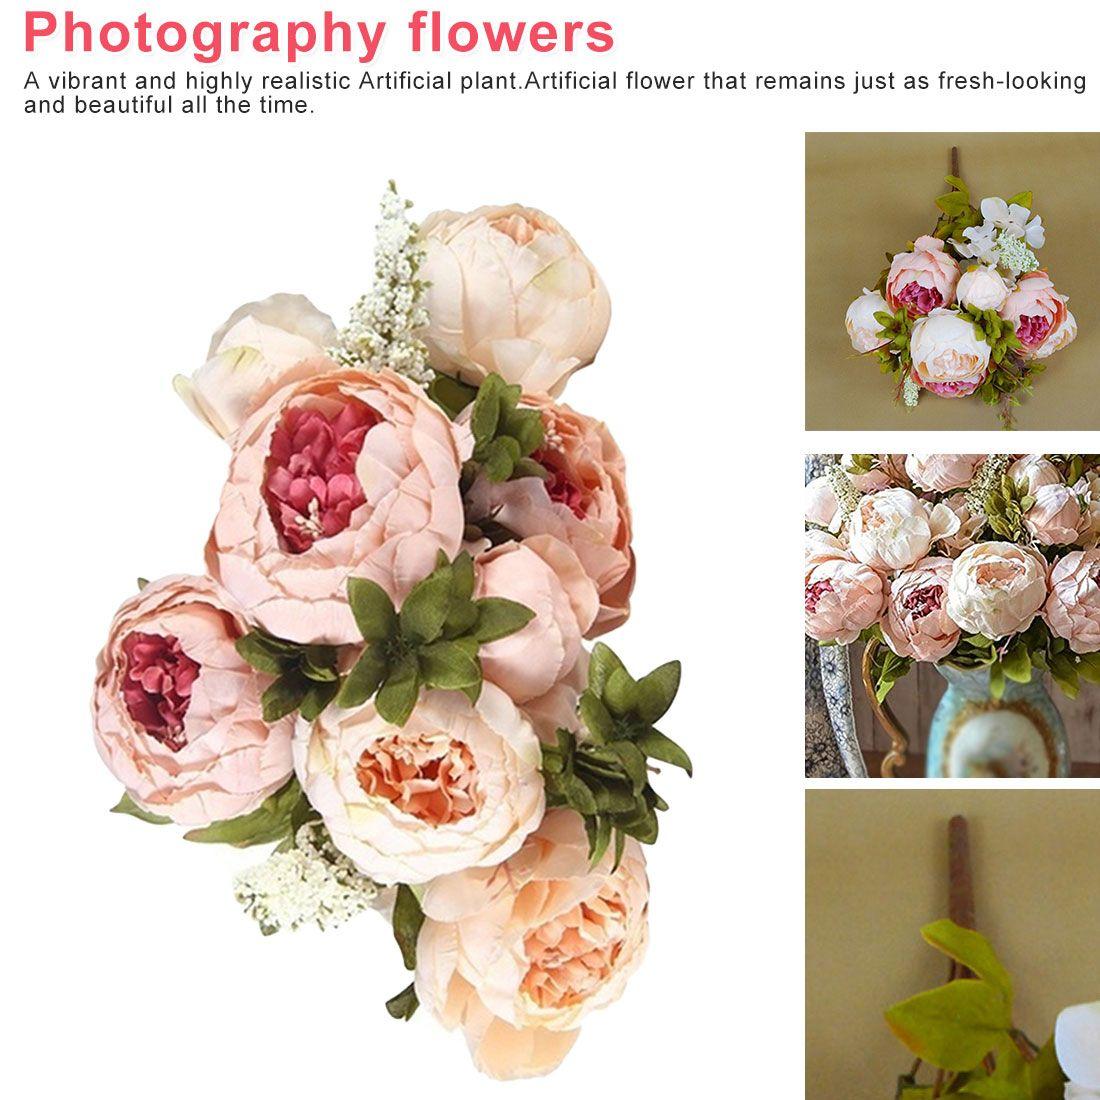 Charming Artificial Flowers Silk Foam European Artificial Peony Decorative Bride Bouquet Home Wedding Decor